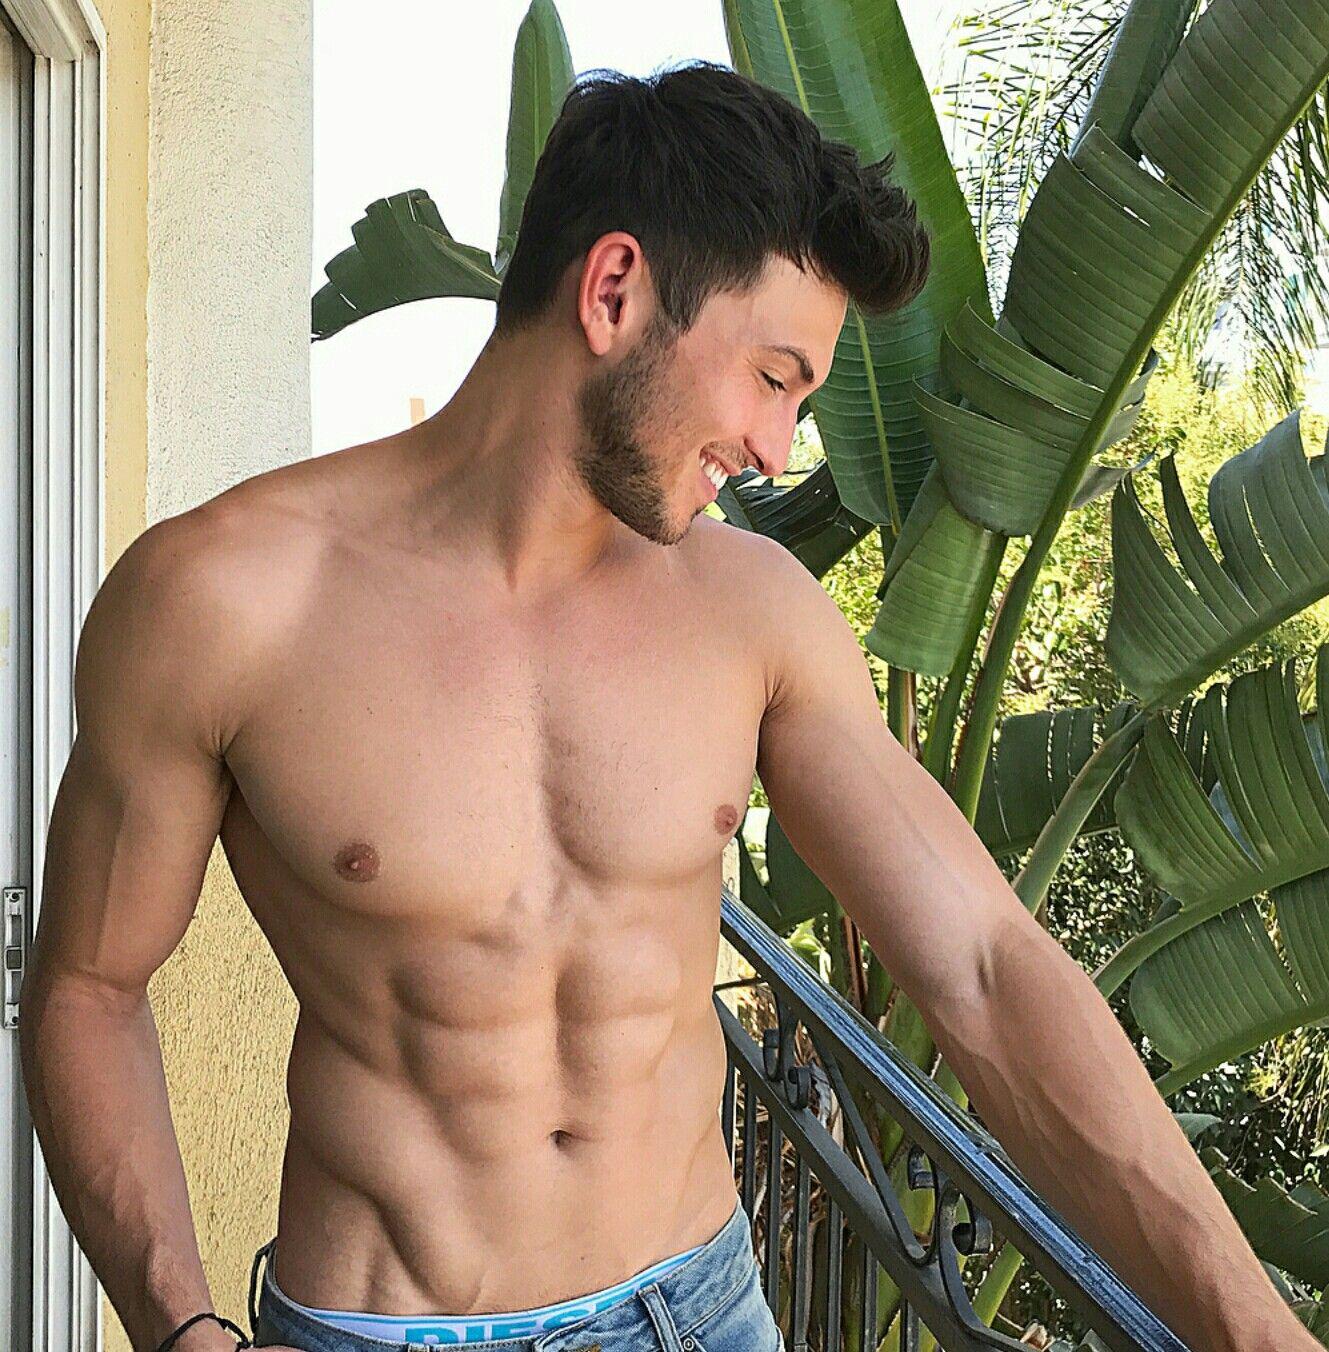 Shirtless Men On The Blog: Robert Scott Wilson Shirtless